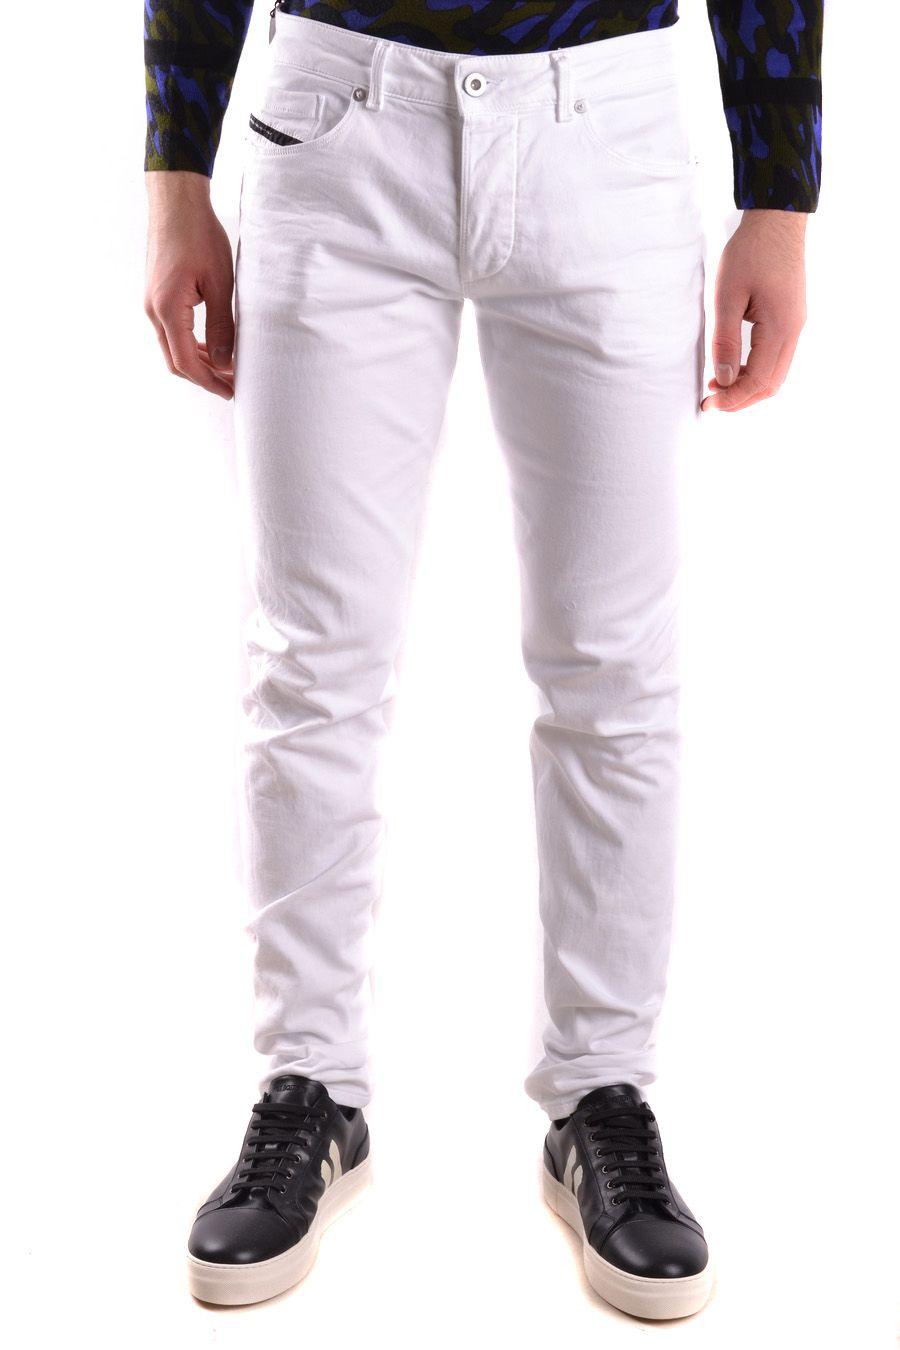 Diesel Black Gold White Cotton Jeans